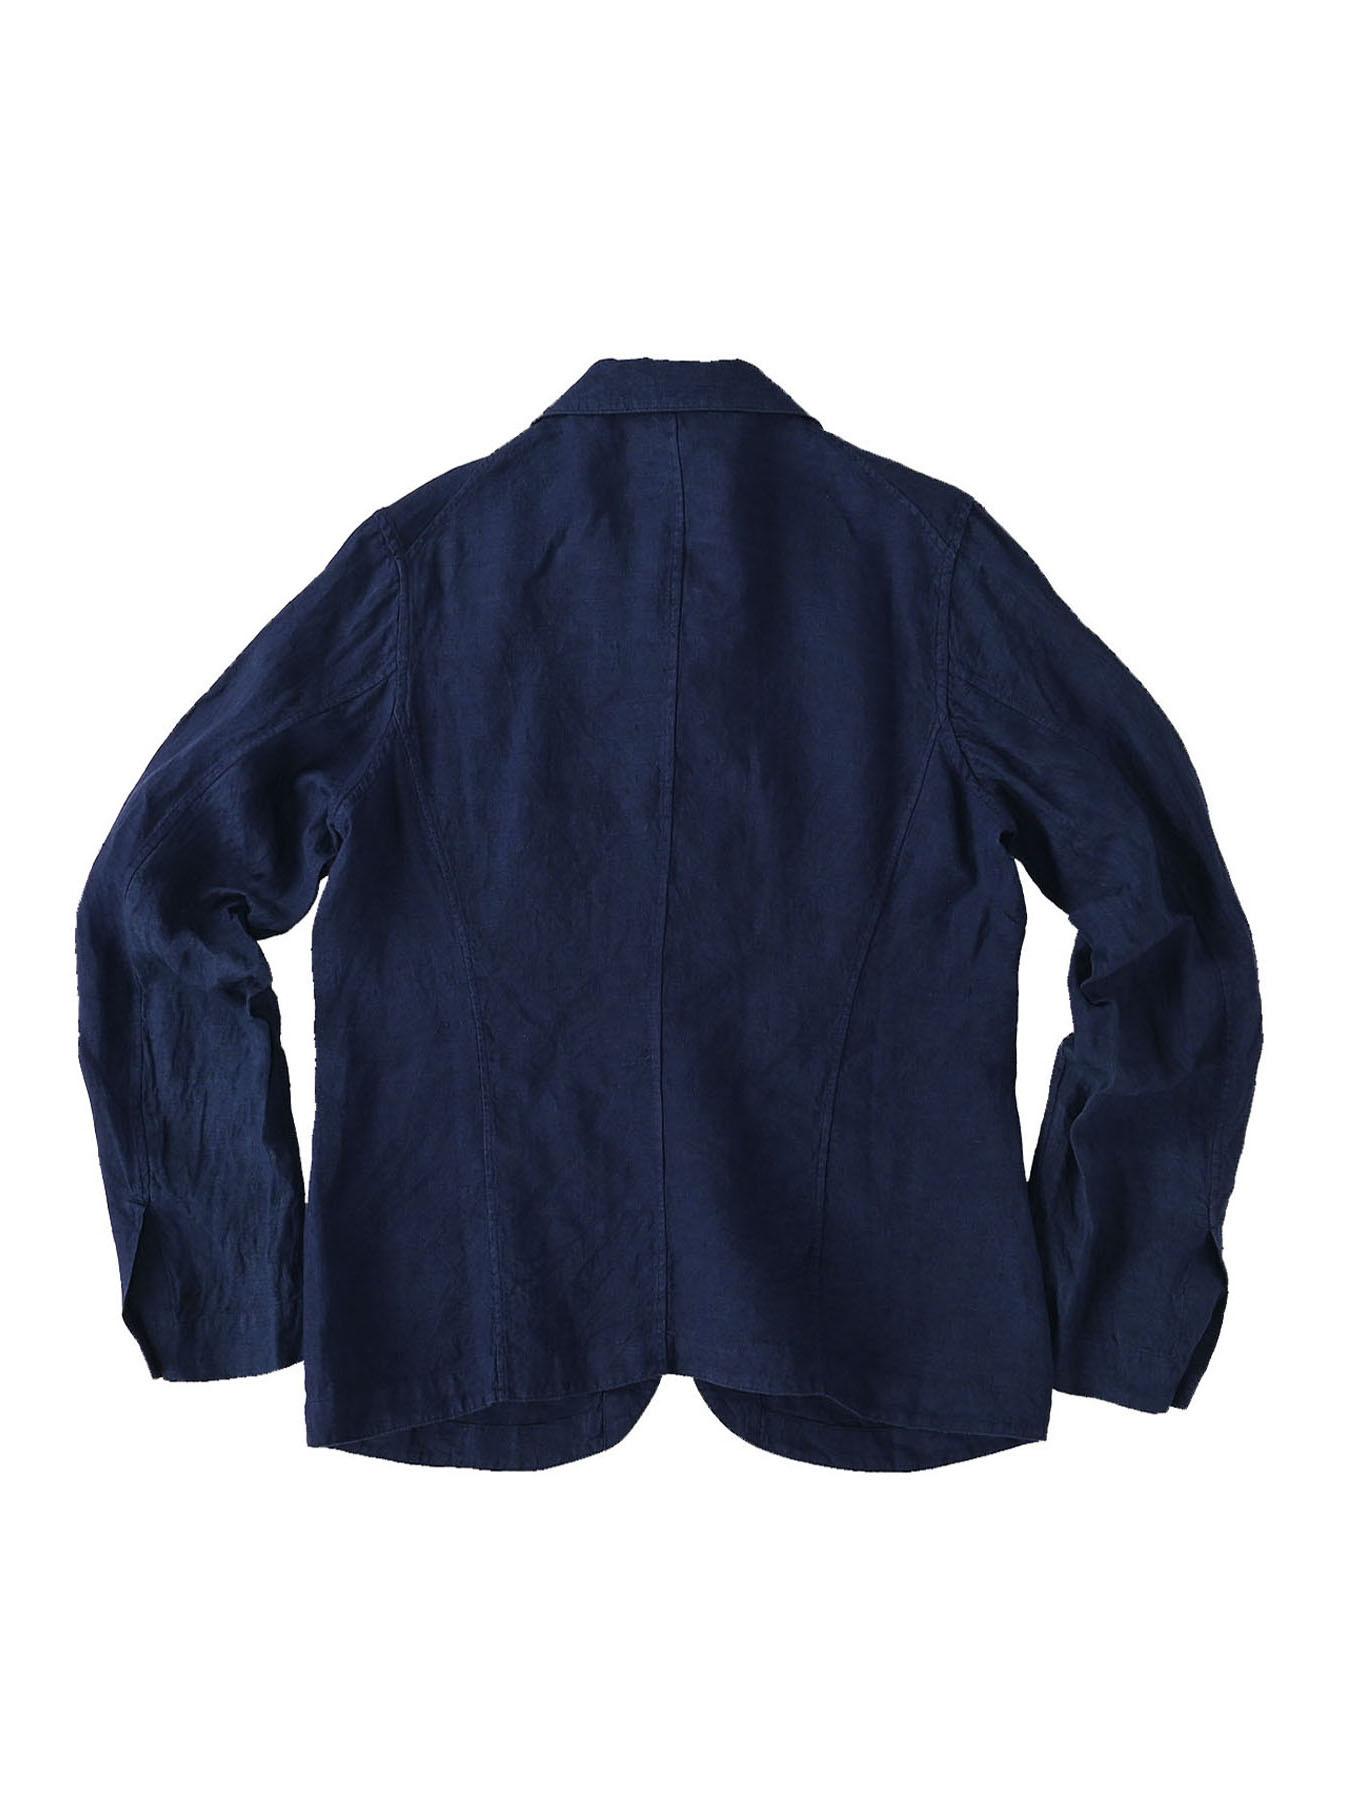 Indigo Indian Linen Flat Shirt Jacket (0521)-7